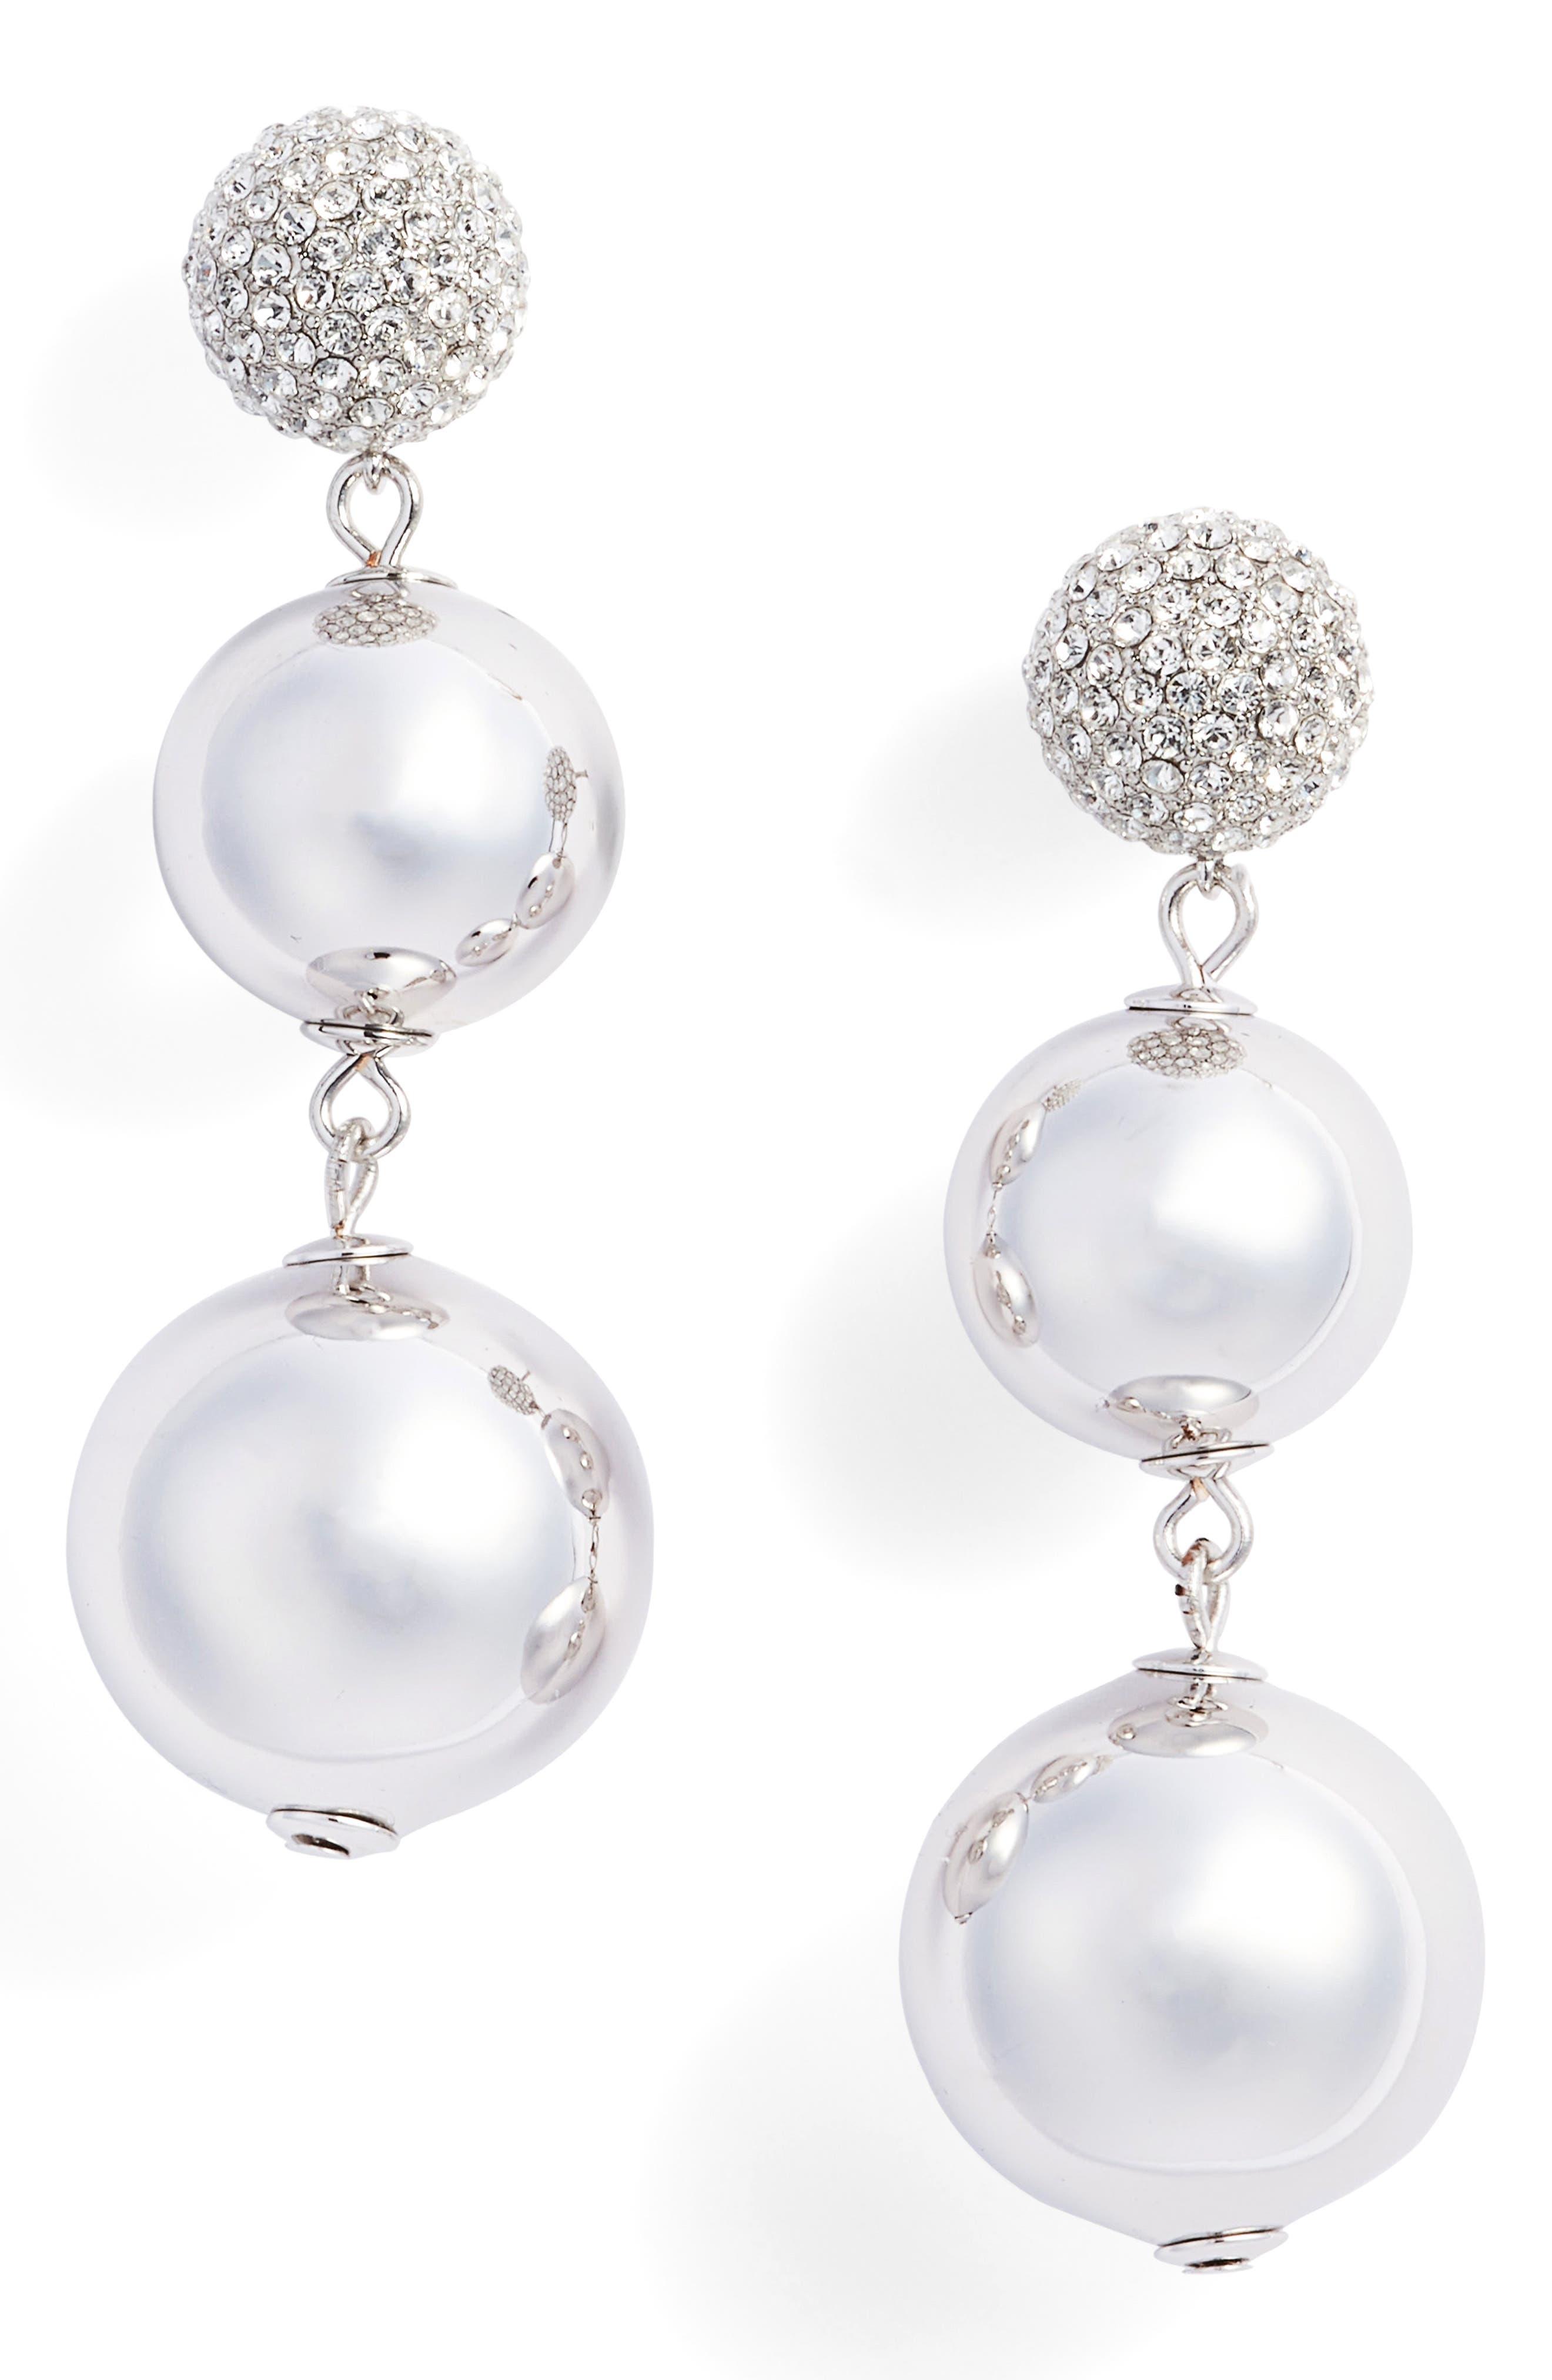 flying colors pavé bauble drop earrings,                         Main,                         color, Silver